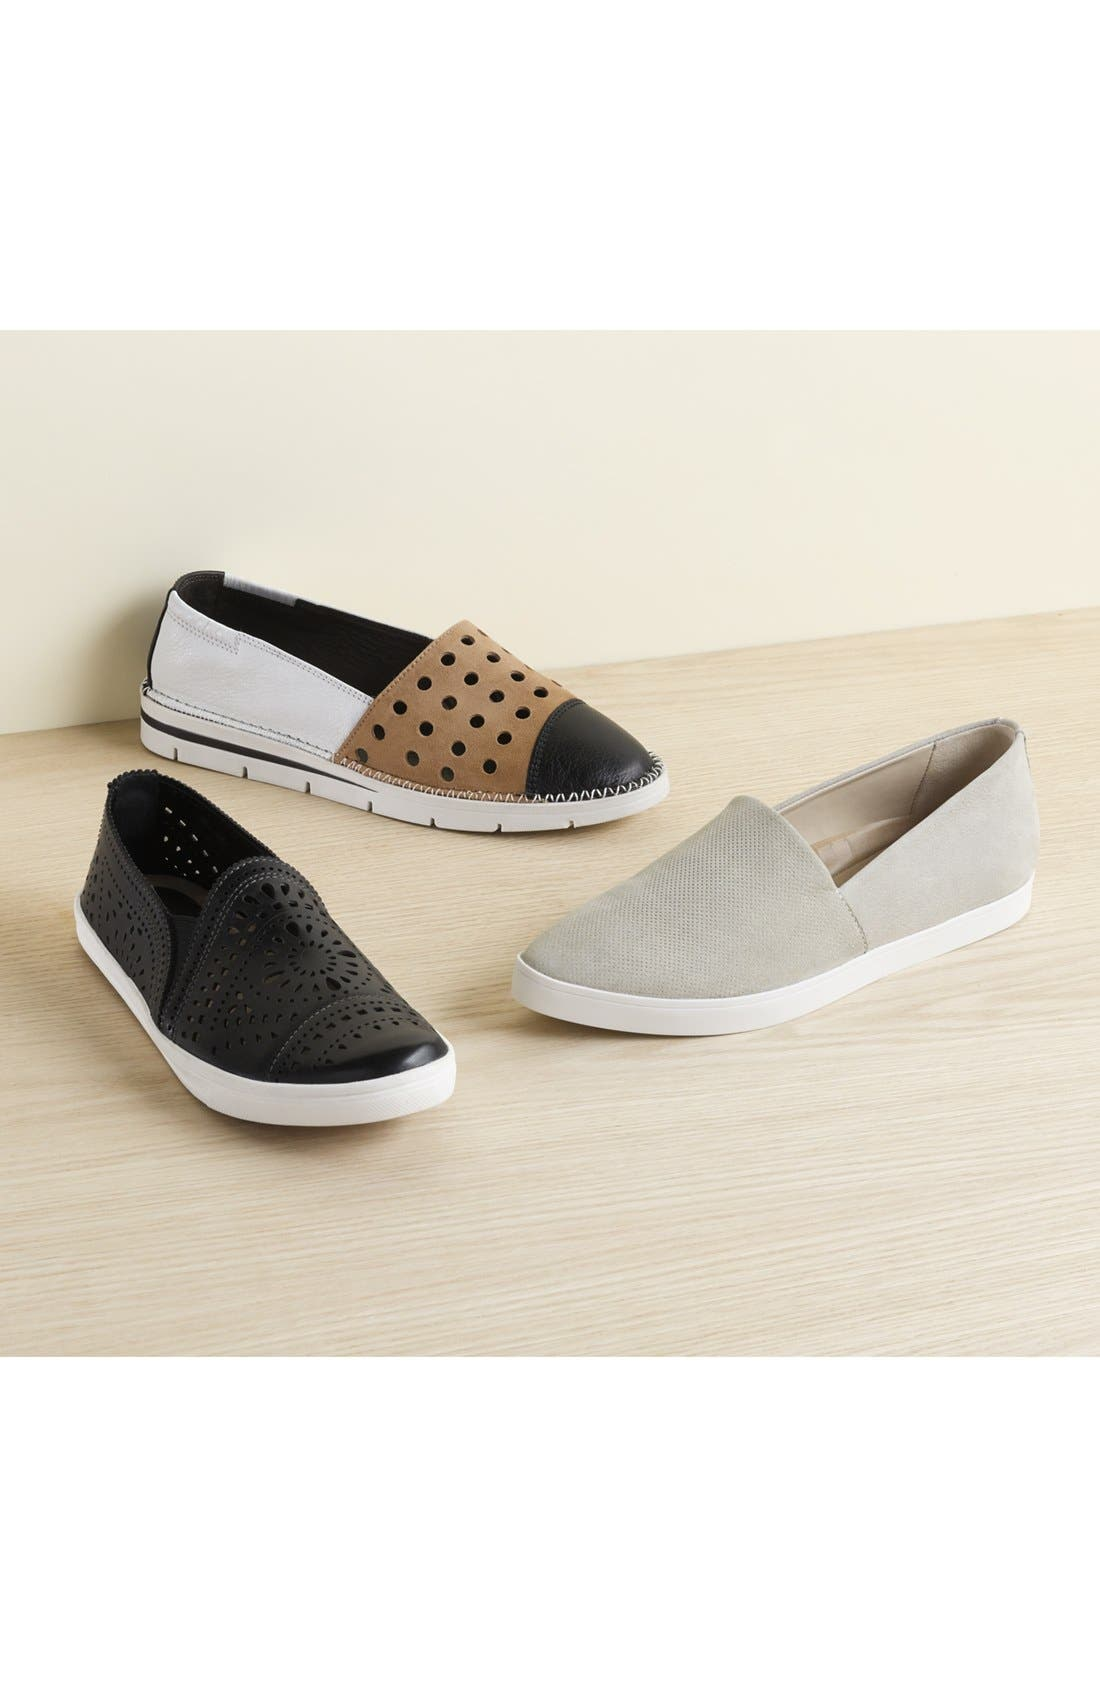 'Vienna' Slip-on Sneaker,                             Alternate thumbnail 9, color,                             040